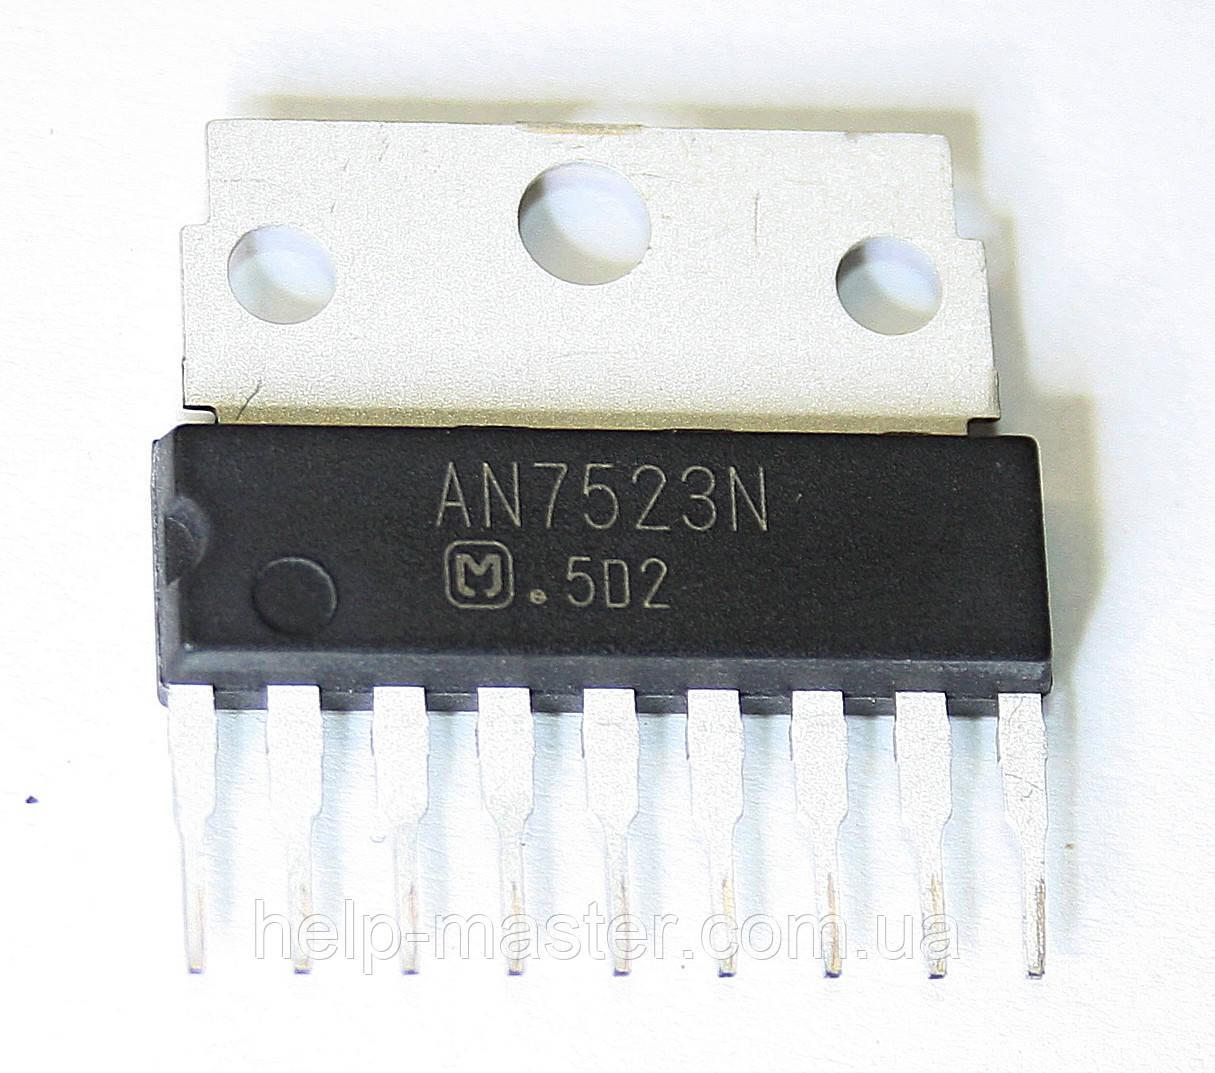 Микросхема AN7523N (SIL-9)